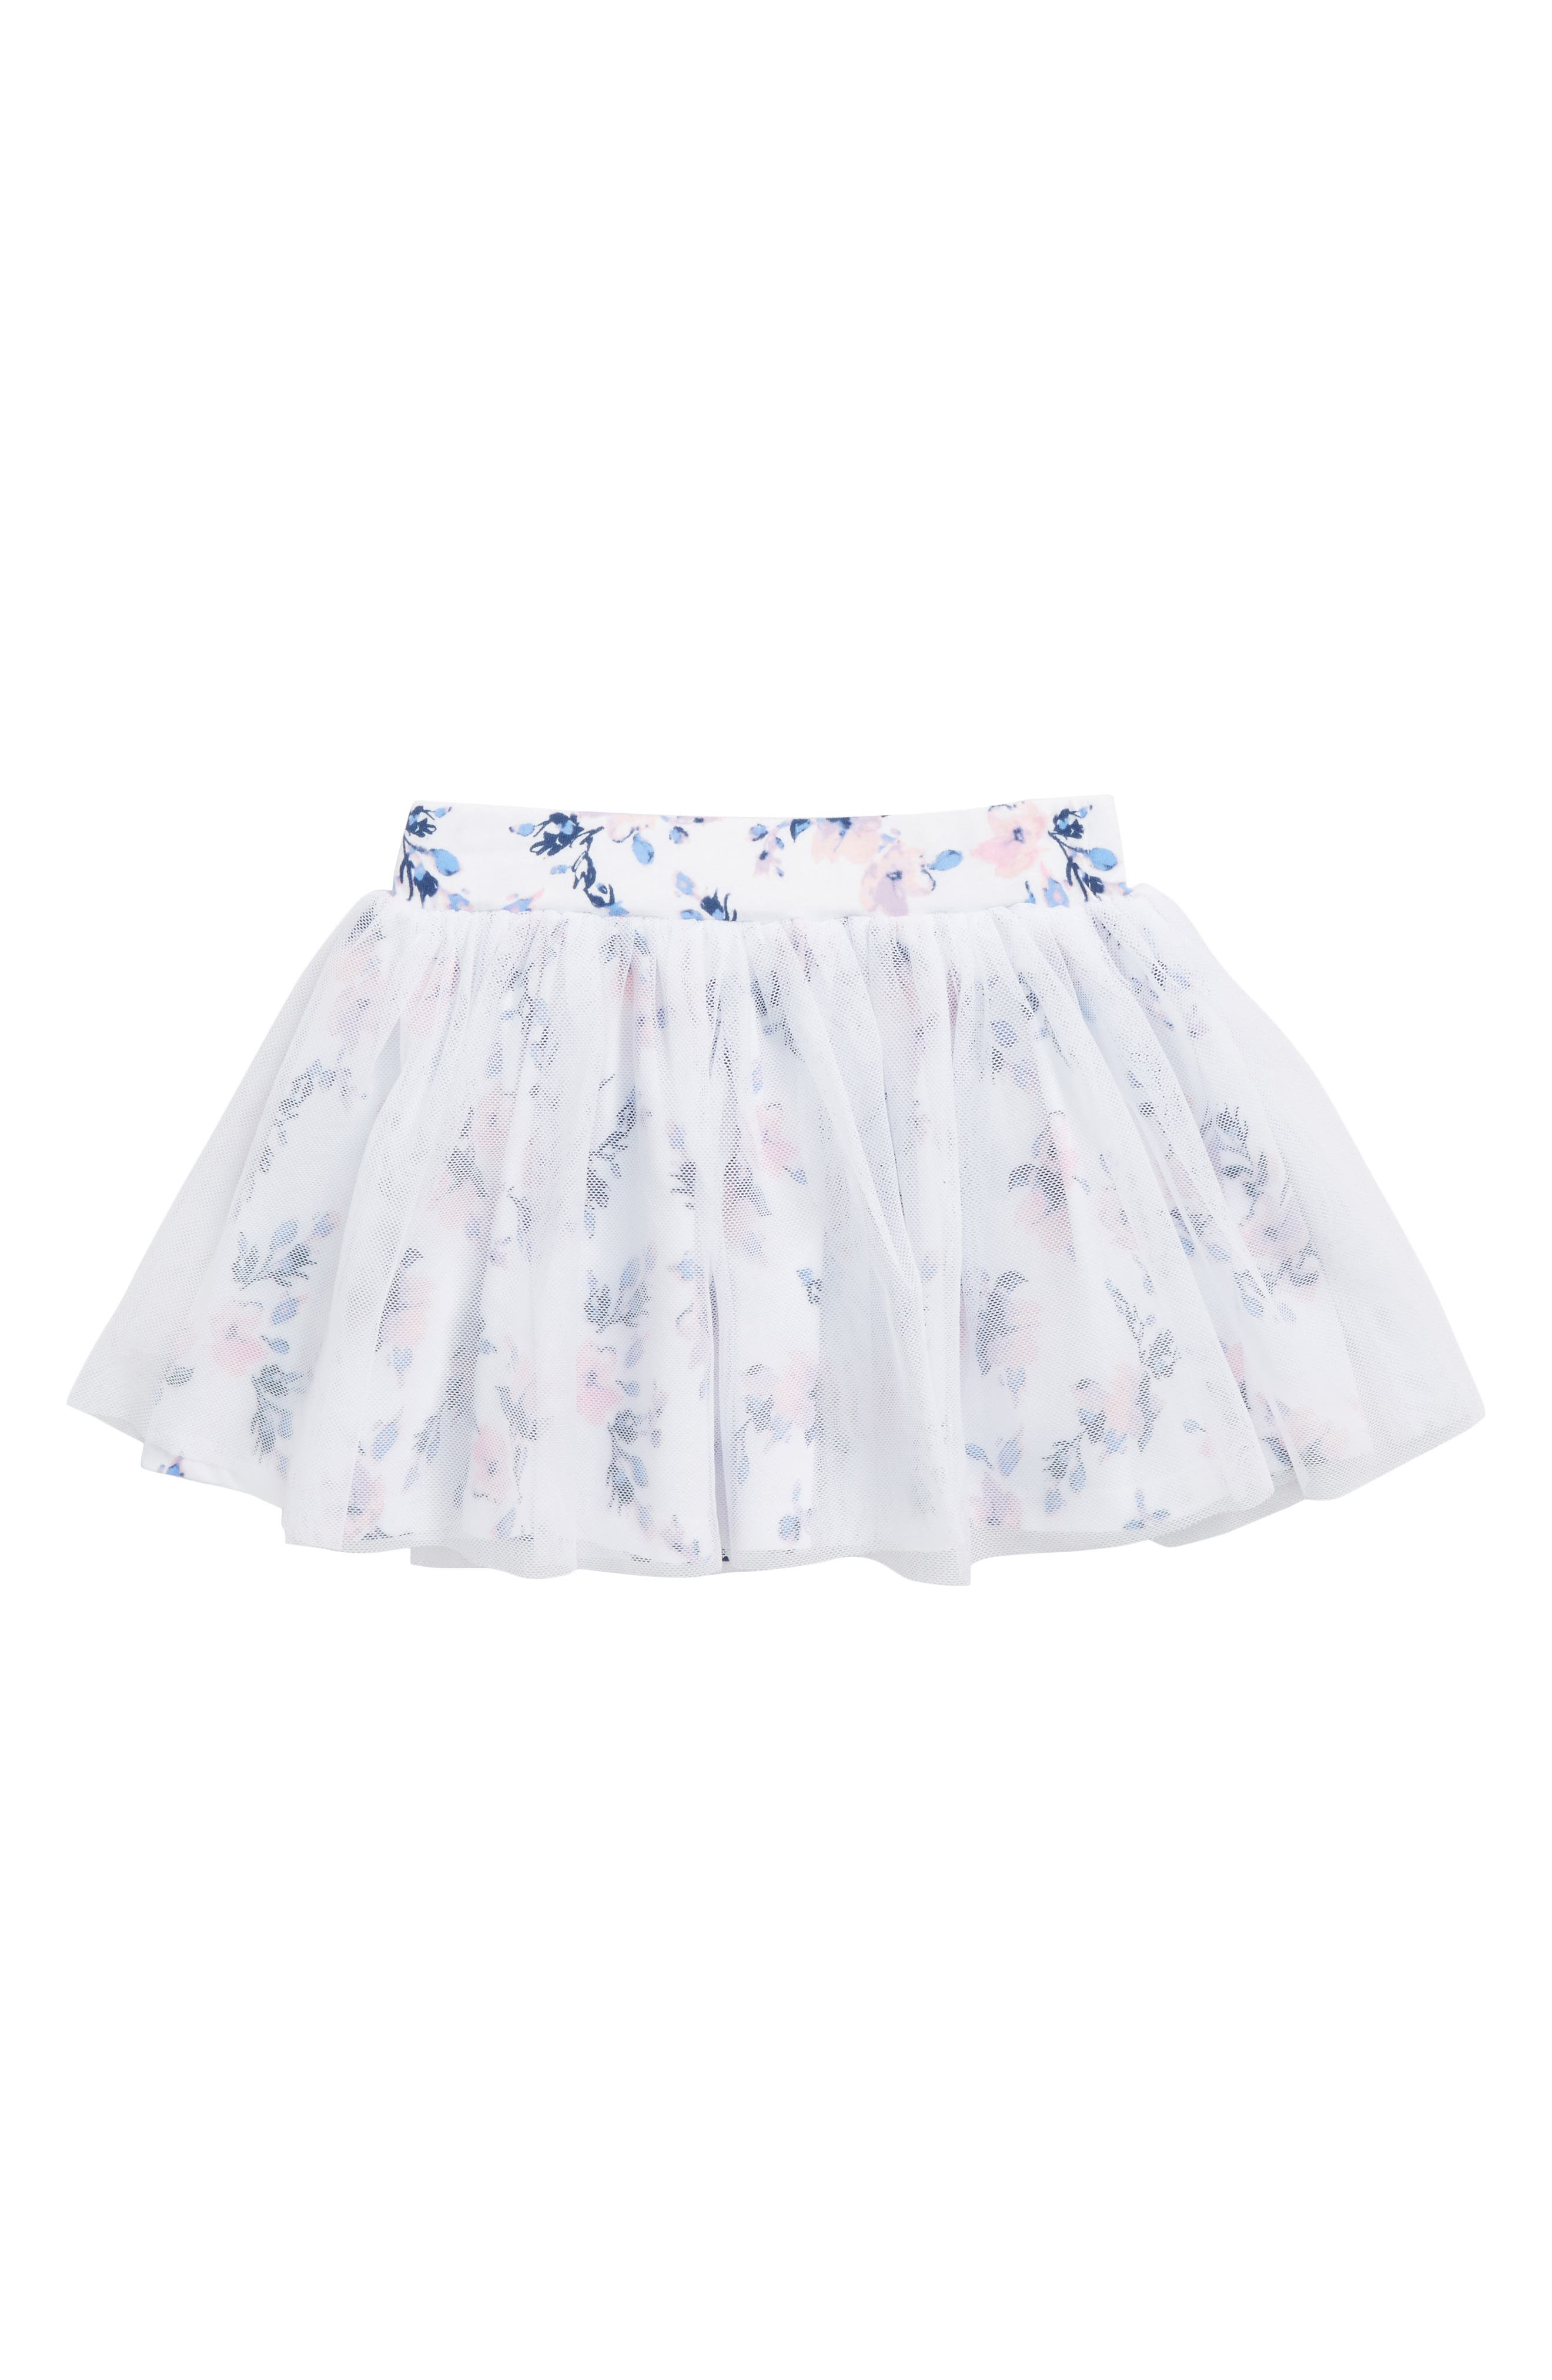 Flower Print Tutu Skirt,                             Main thumbnail 1, color,                             Optic White